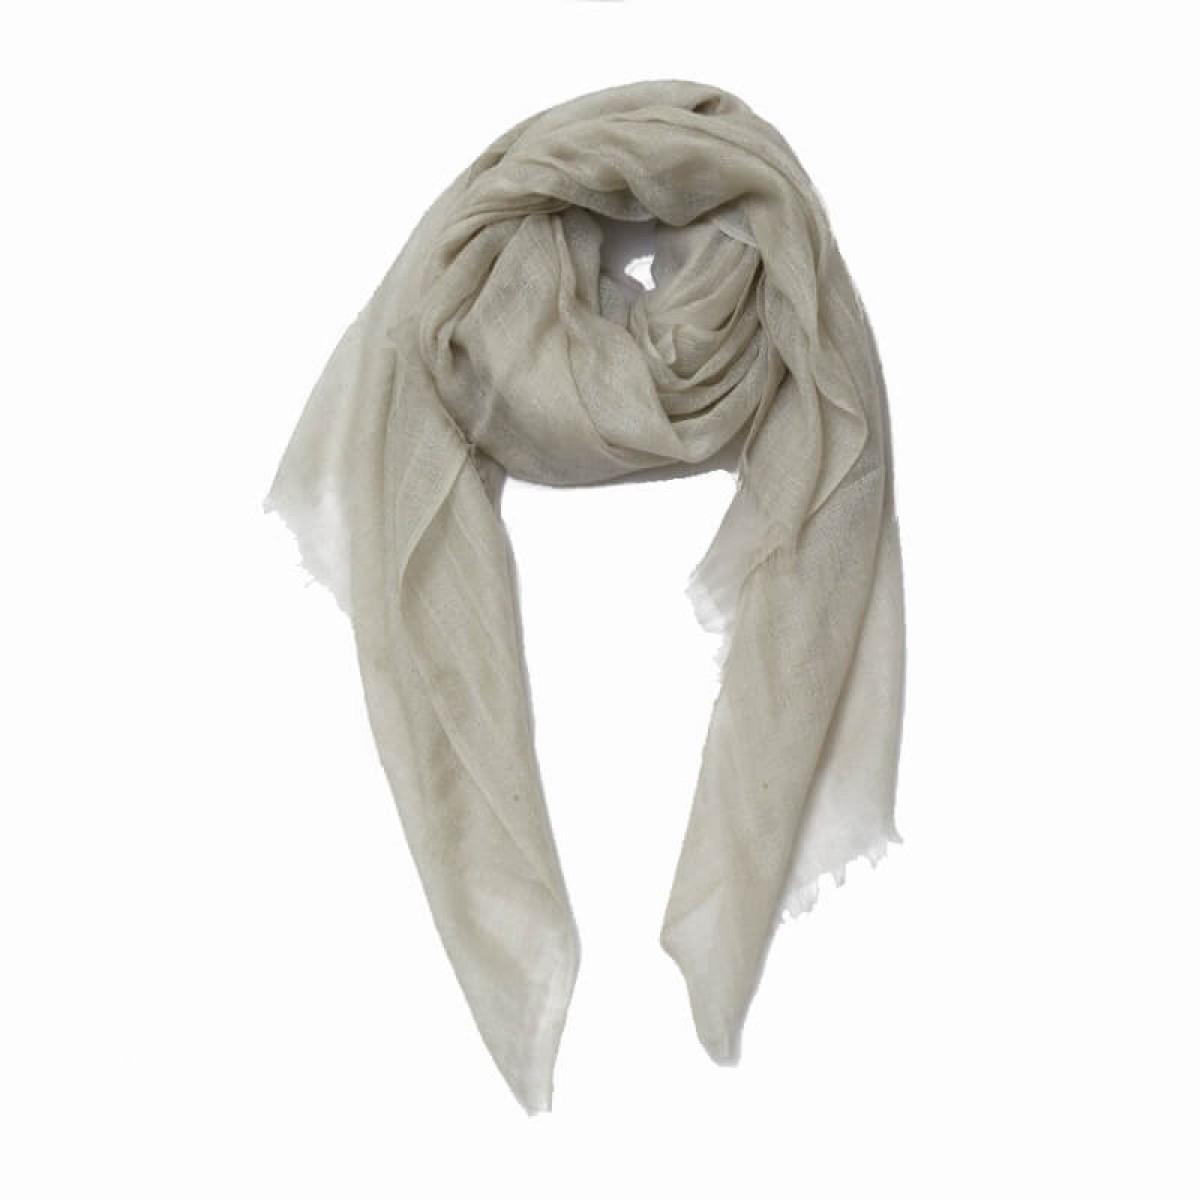 Light beige sheer pashmina scarf